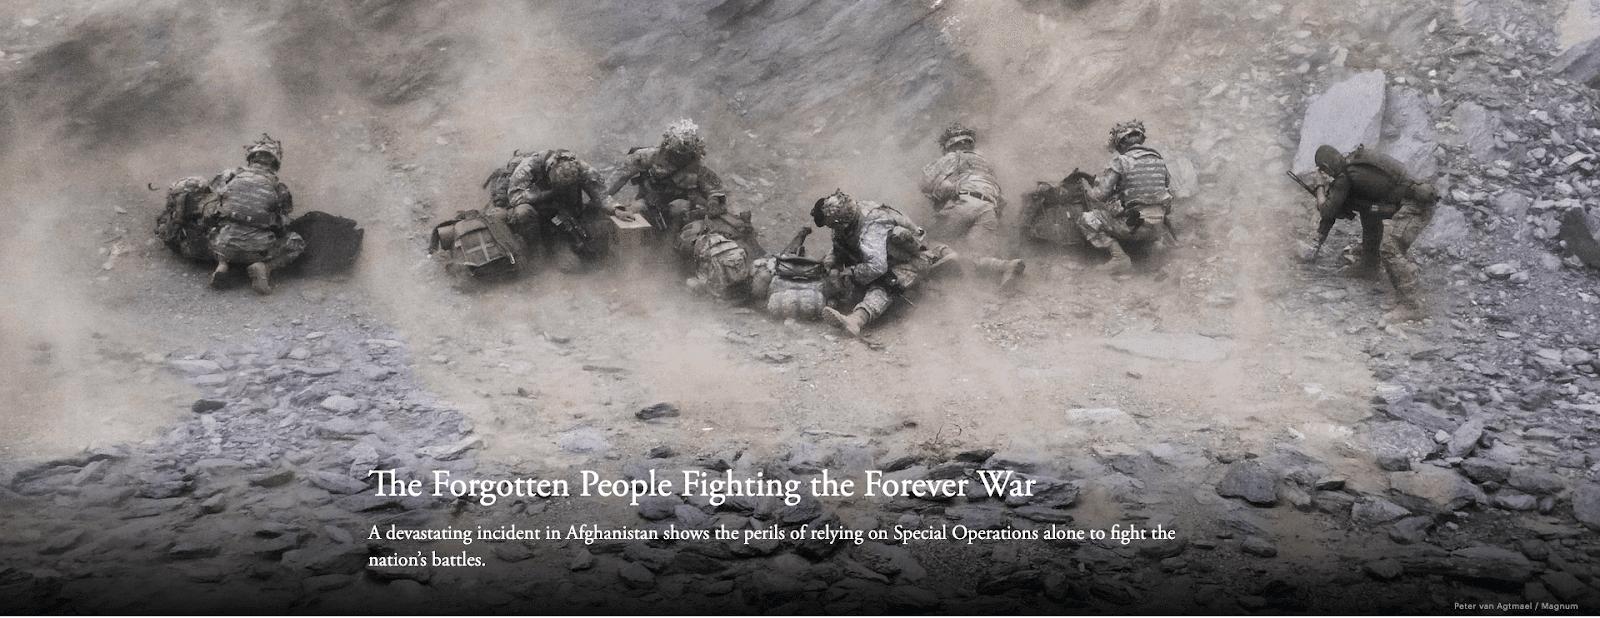 """The Forgotten People Fighting the Forever War"" memorable headline"